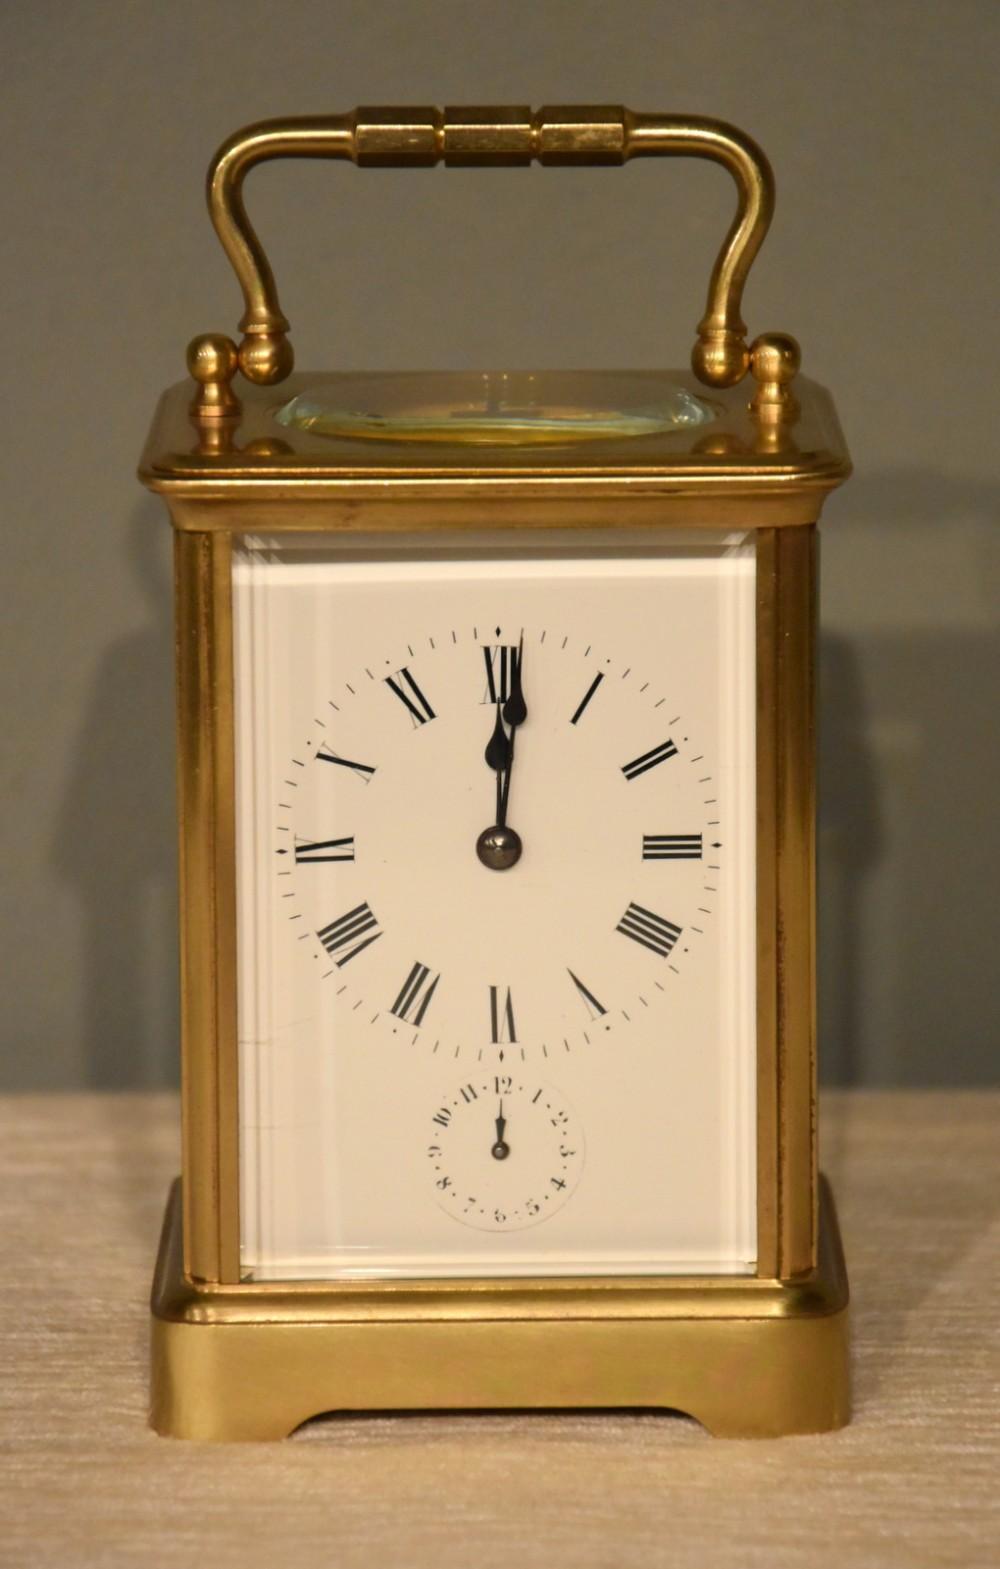 an alarm carriage timepiece by richard cie